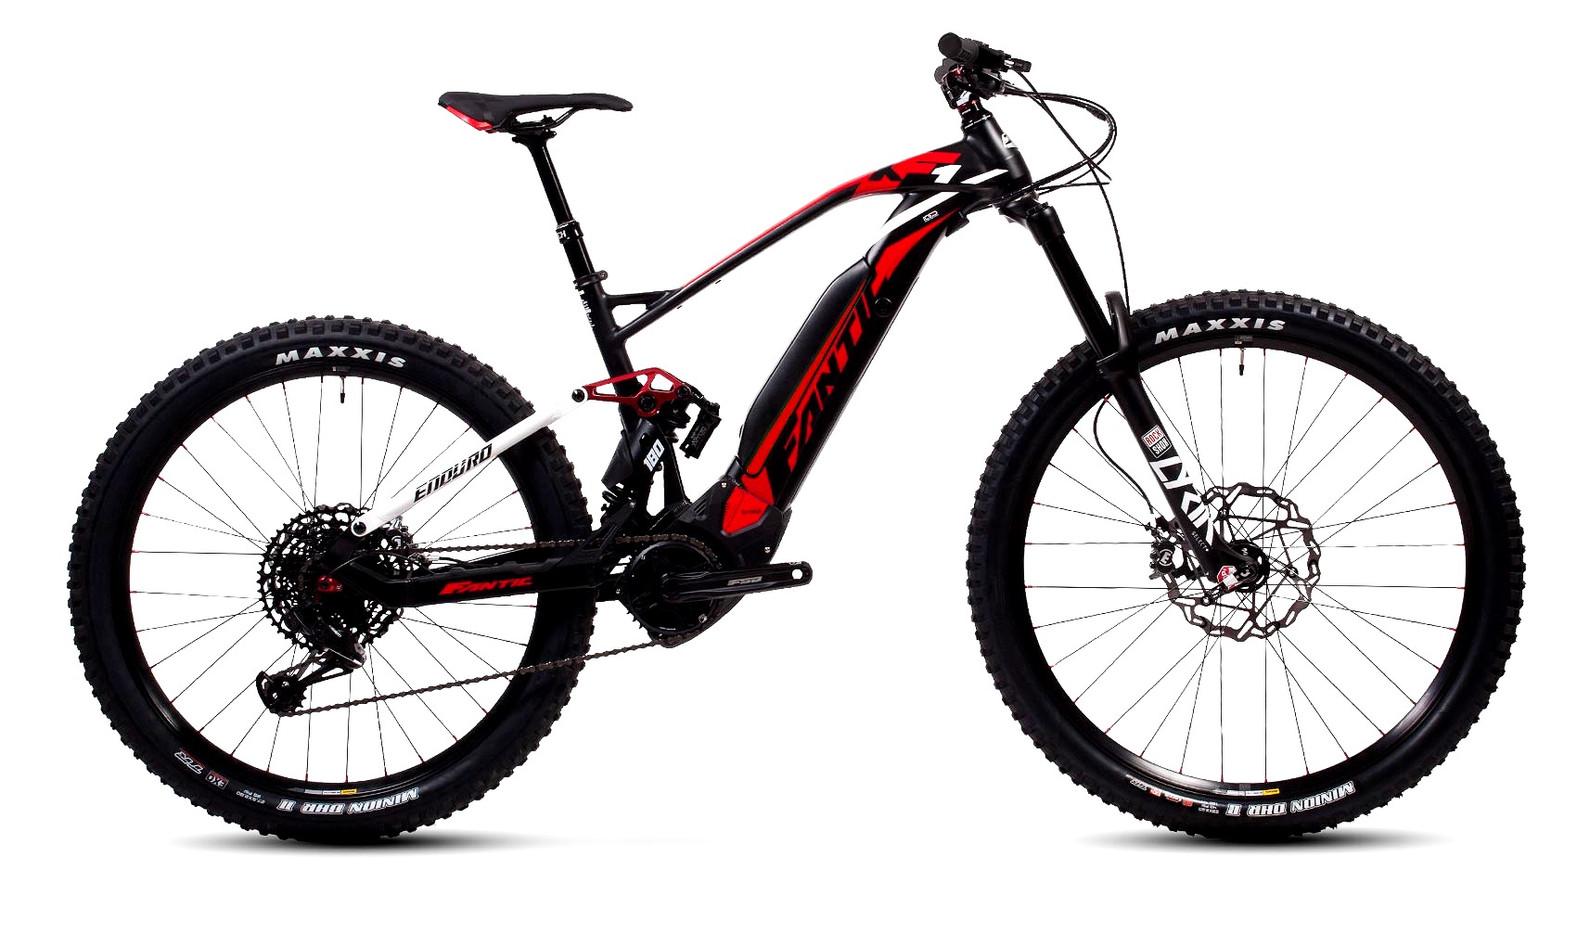 Xf1 180 Race Red